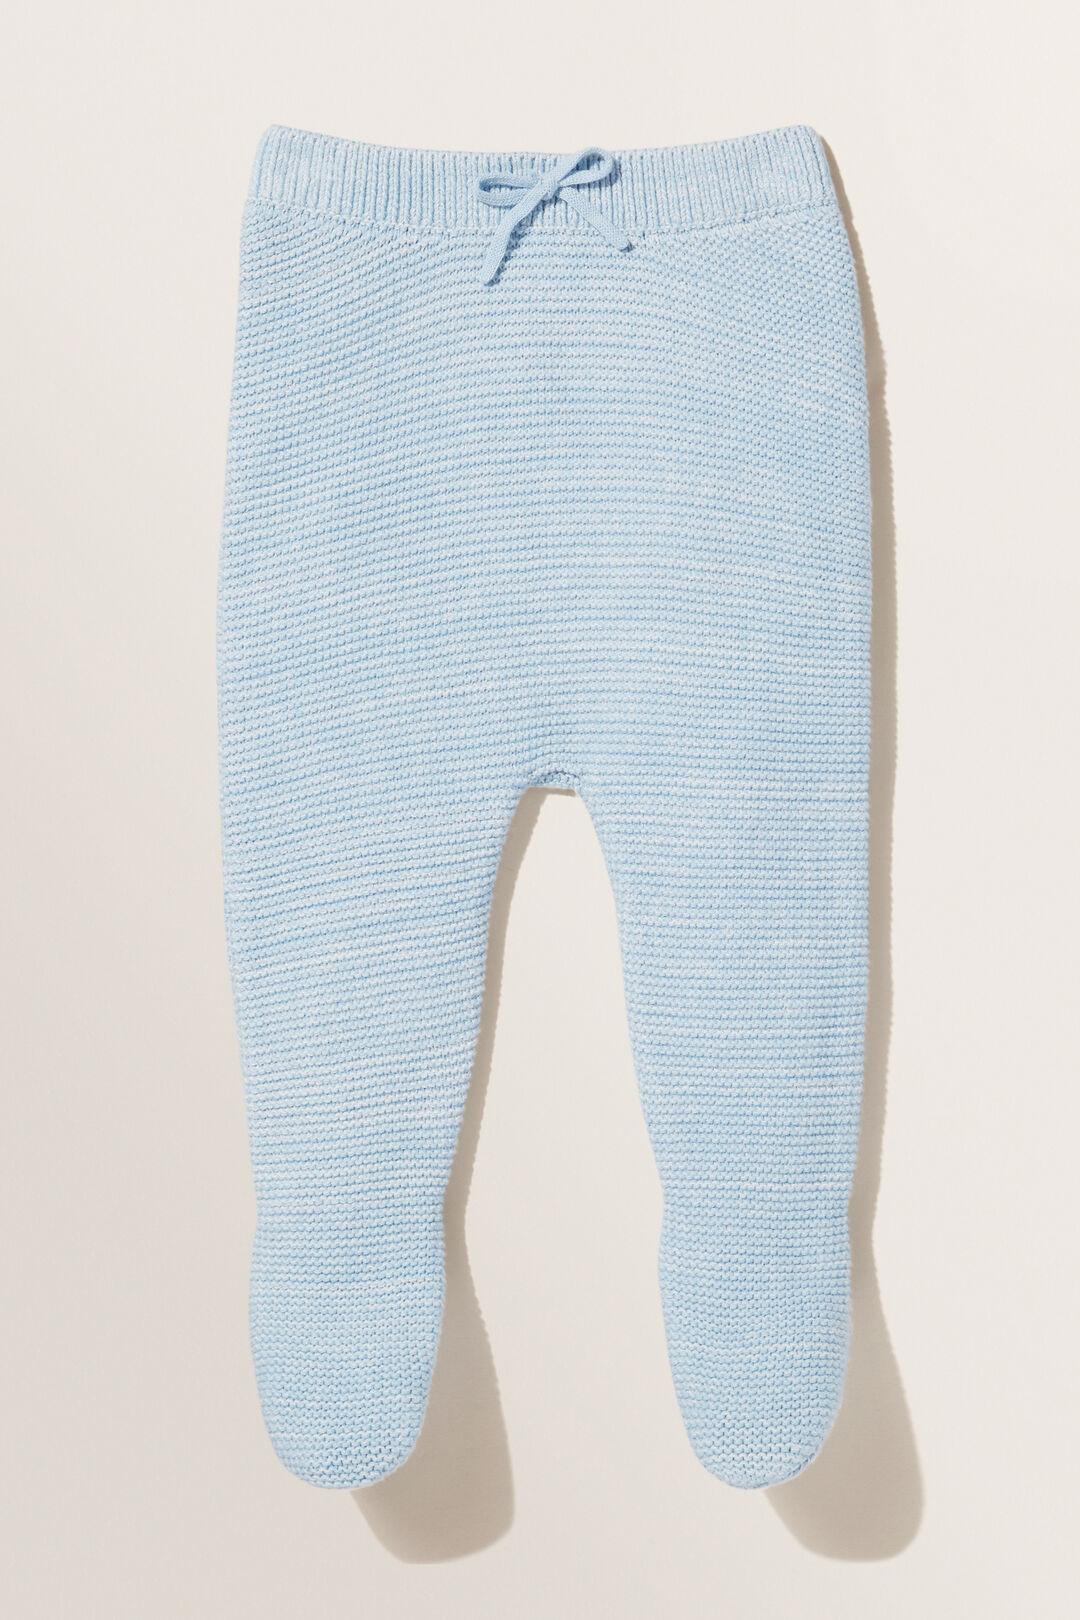 Footed Leggings  Powder Blue  hi-res